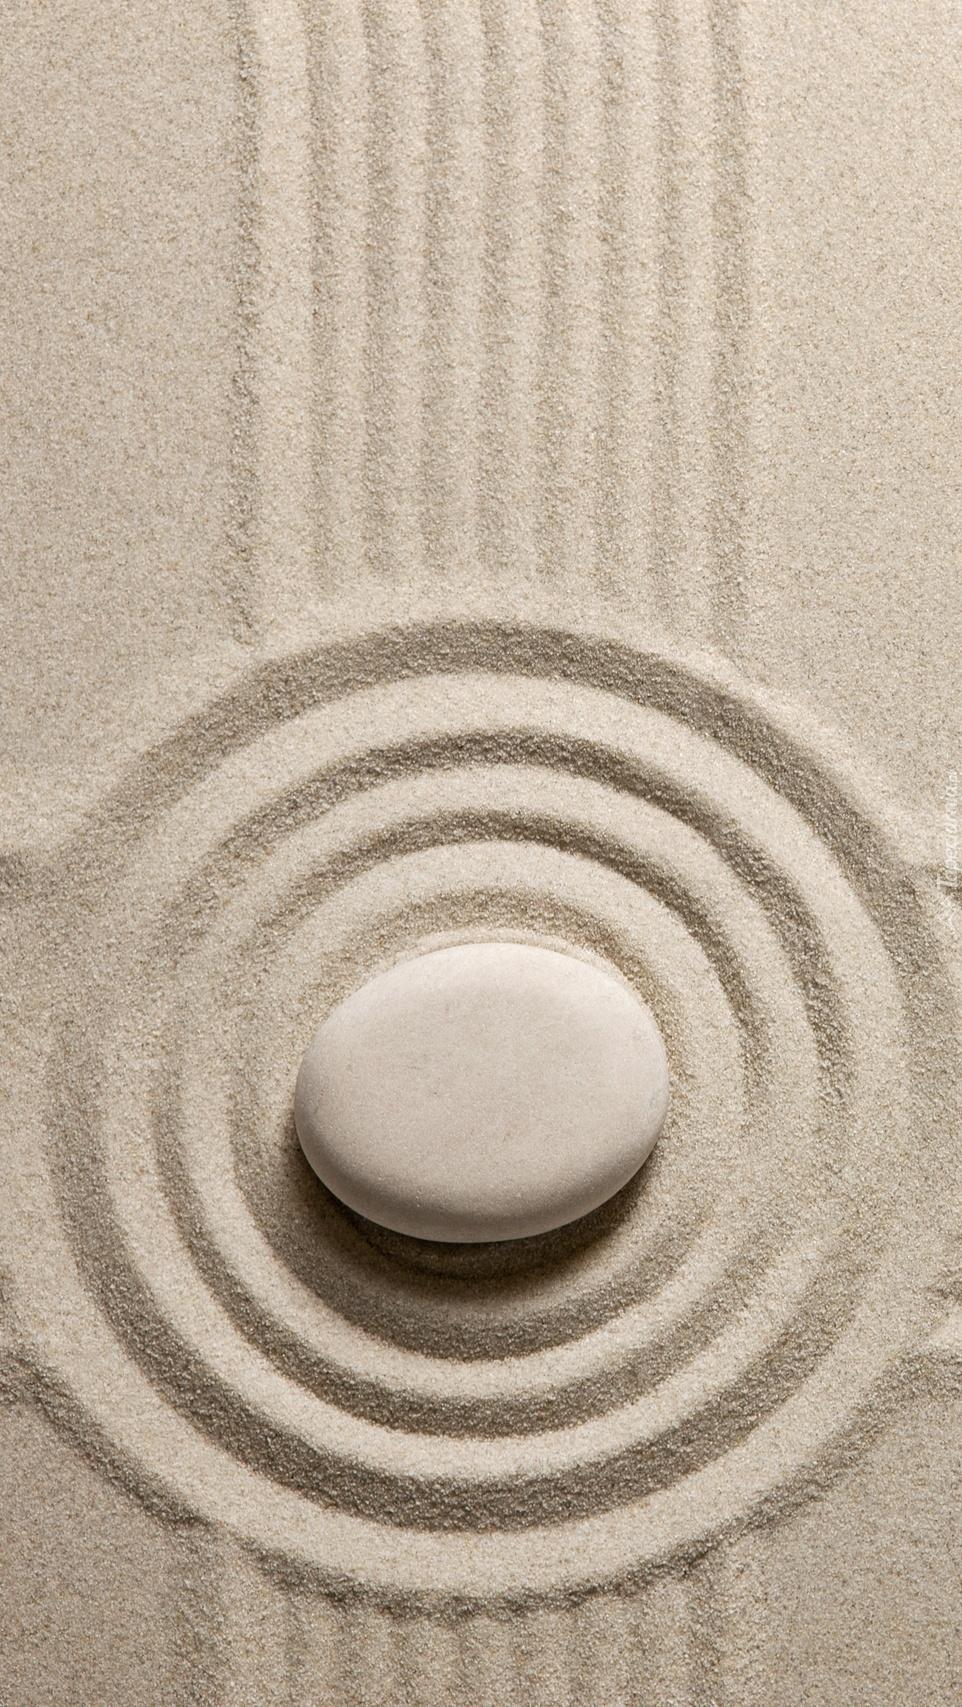 Kamień na piasku